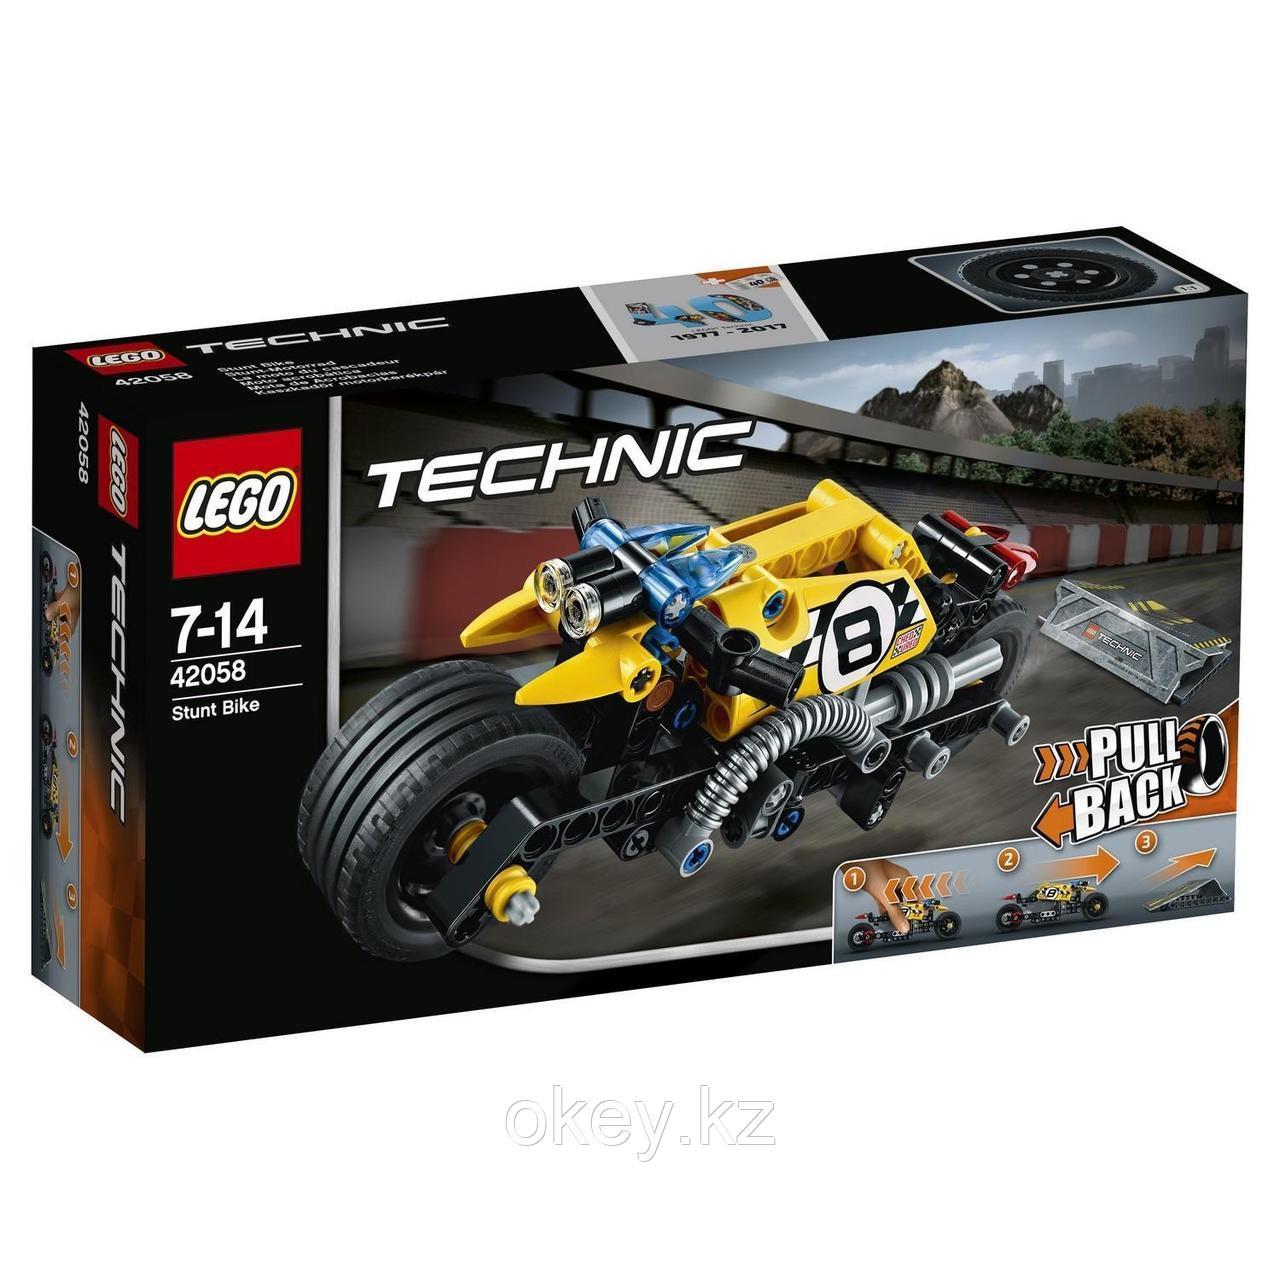 LEGO Technic: Мотоцикл для трюков 42058